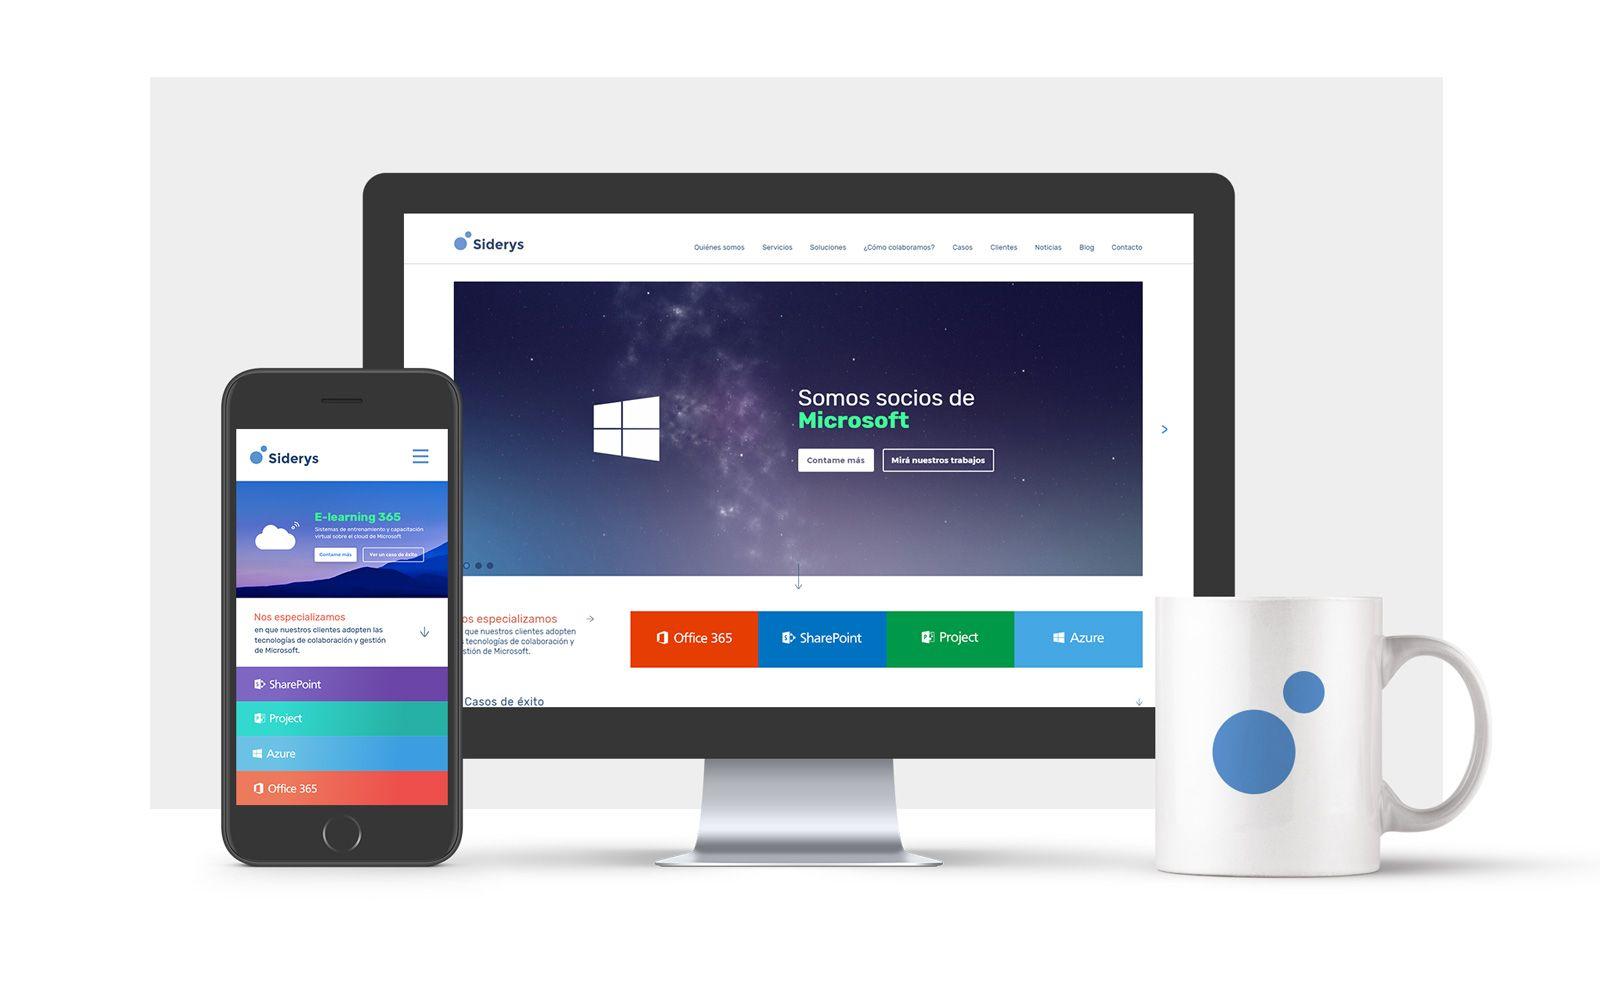 Siderys-web-design